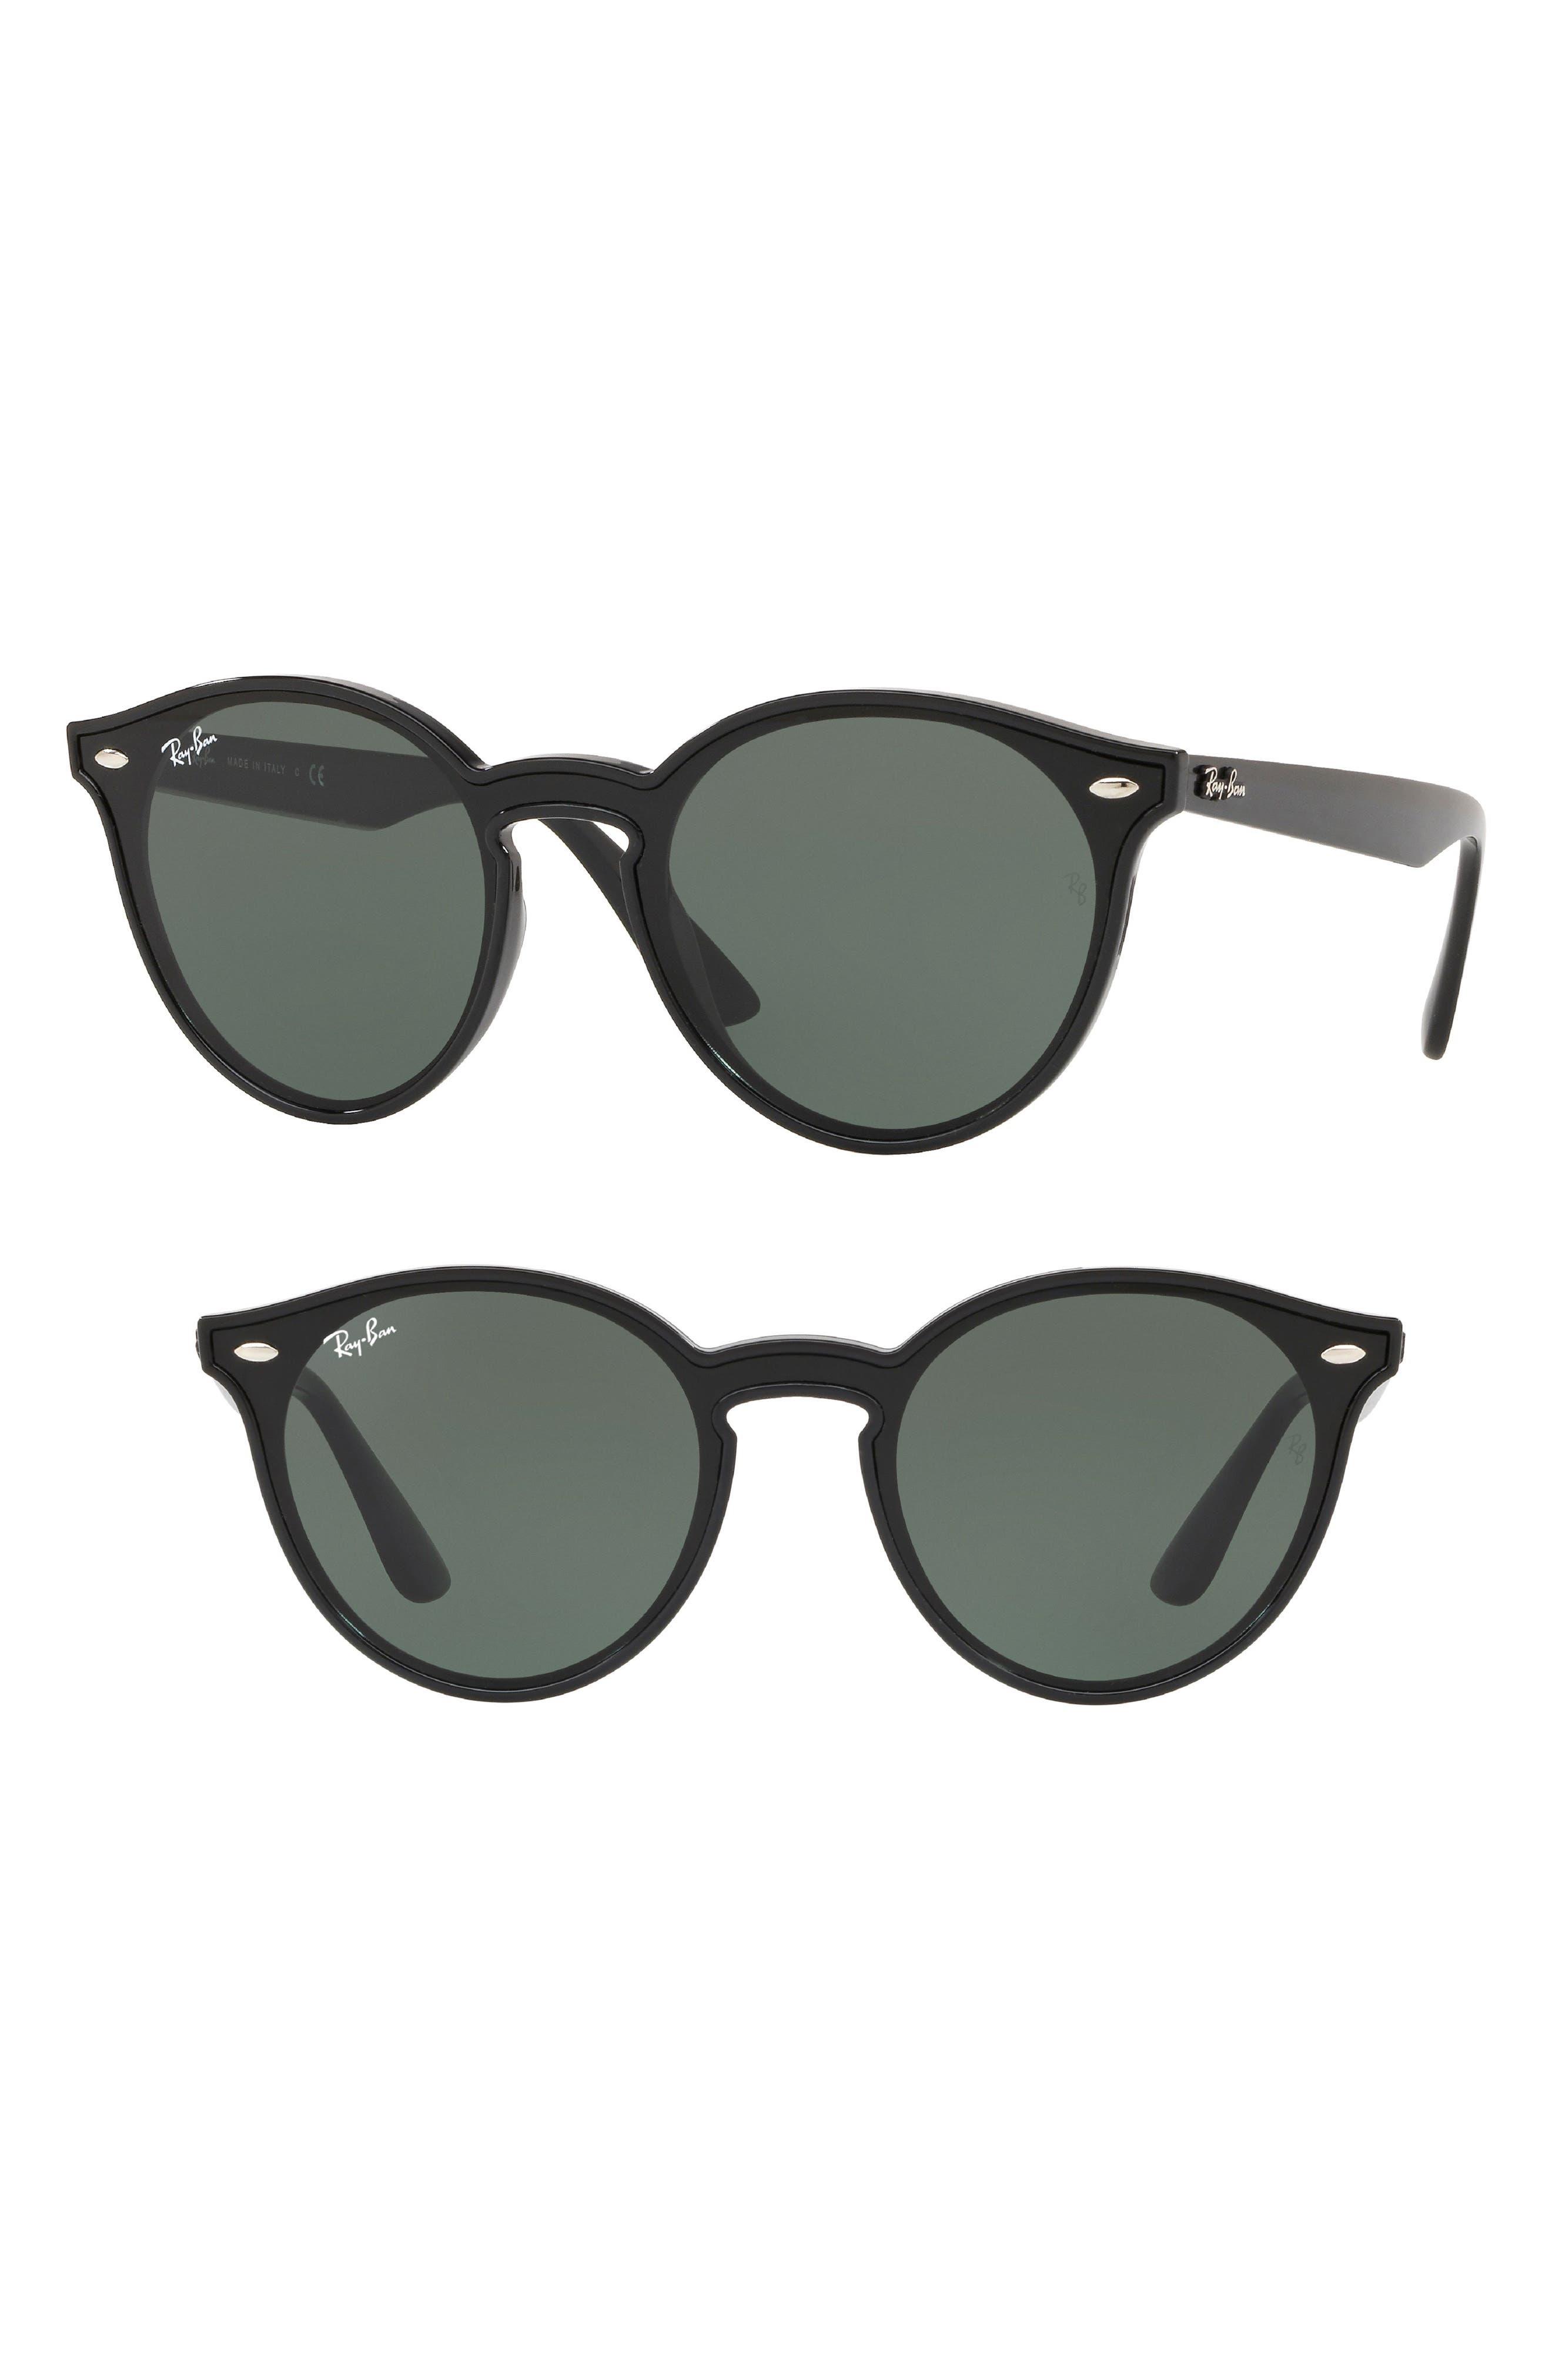 Blaze 37mm Round Sunglasses,                             Main thumbnail 1, color,                             BLACK SOLID